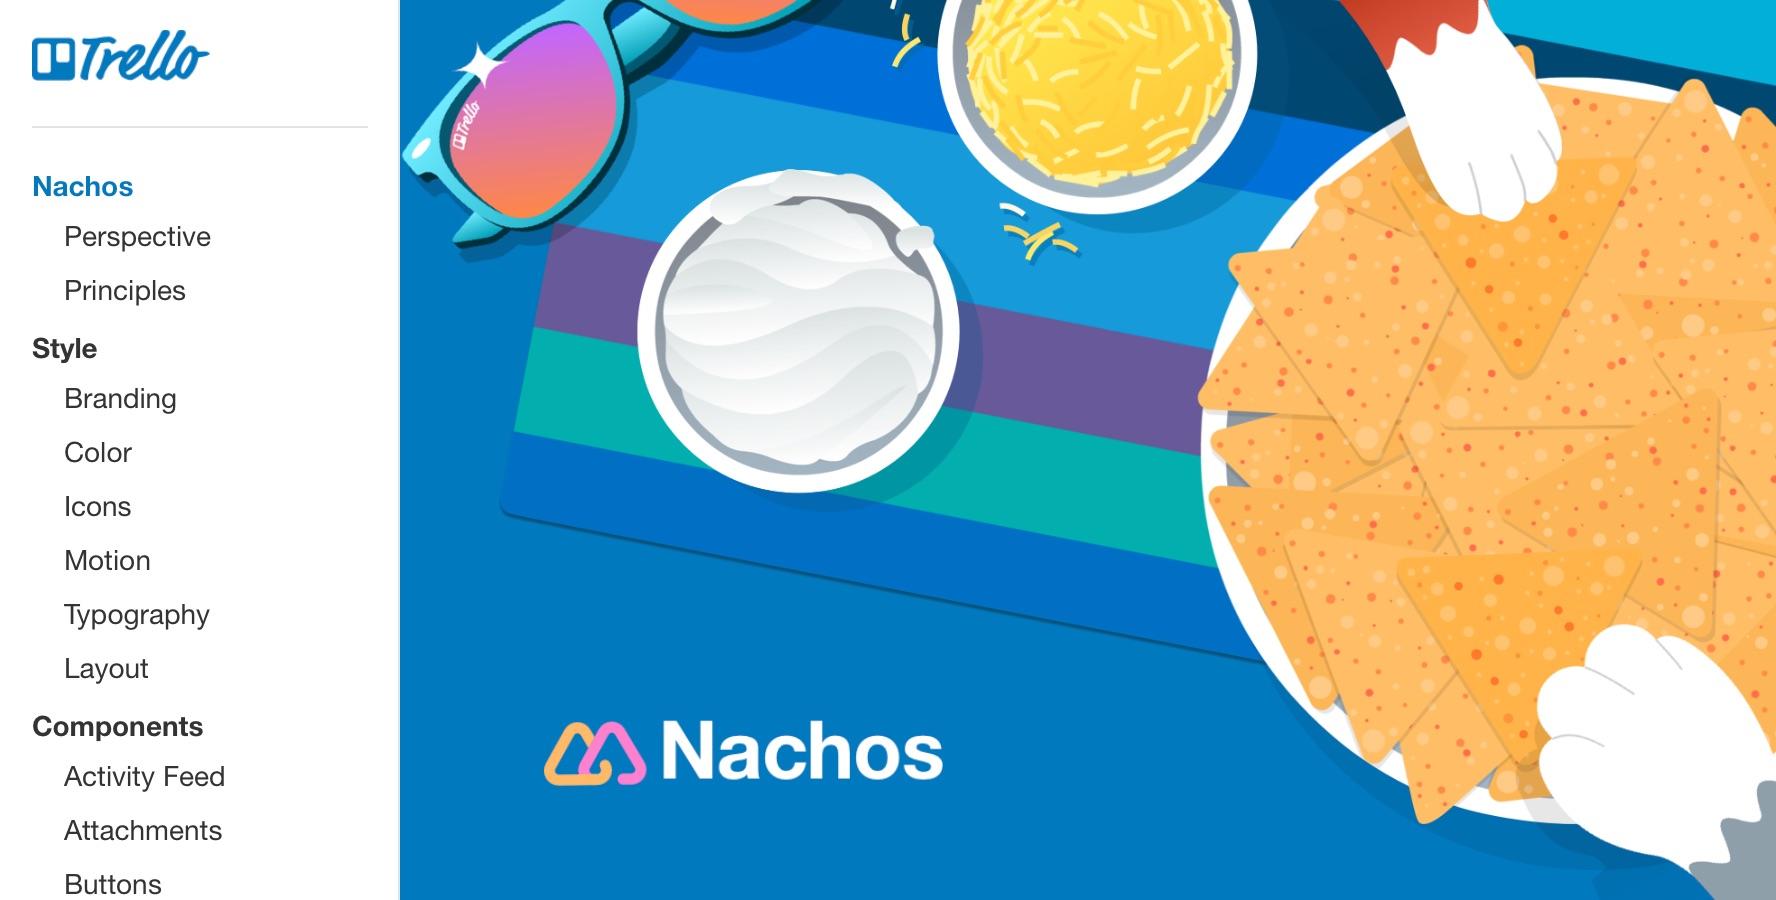 nachos-lead.jpg